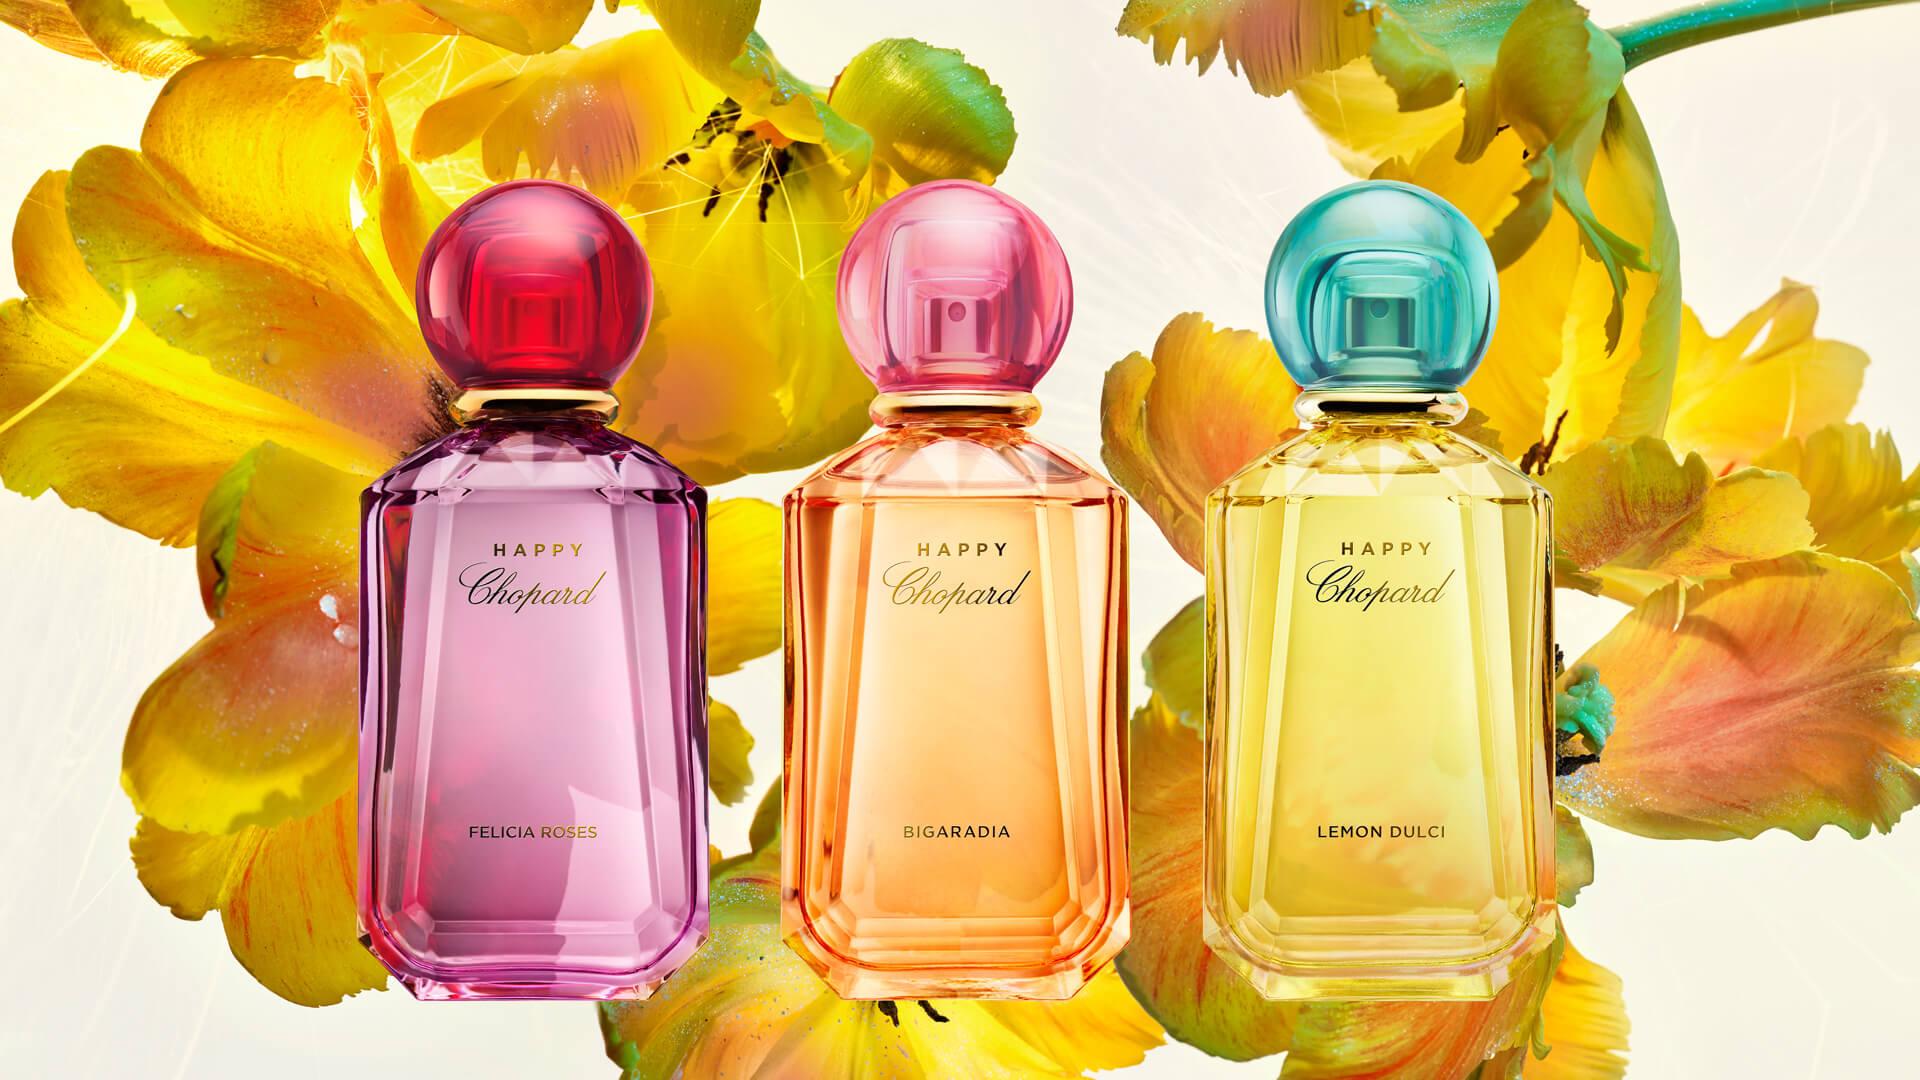 chopard-gmg-production-happy-fragrances